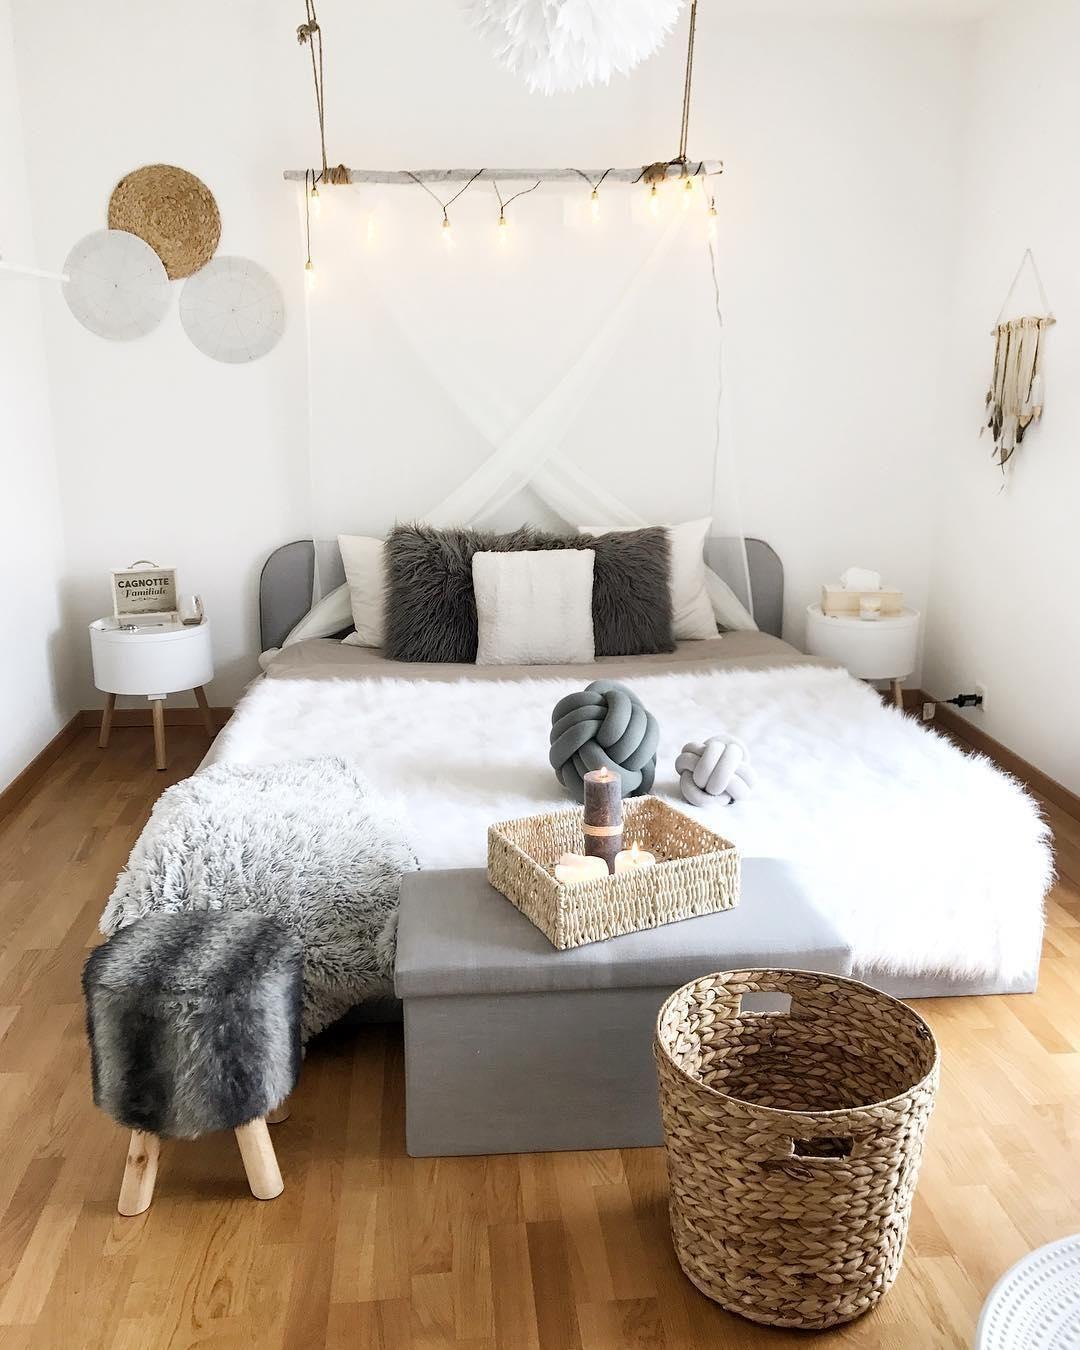 cozy dreams in diesem traumhaften schlafzimmer in grau